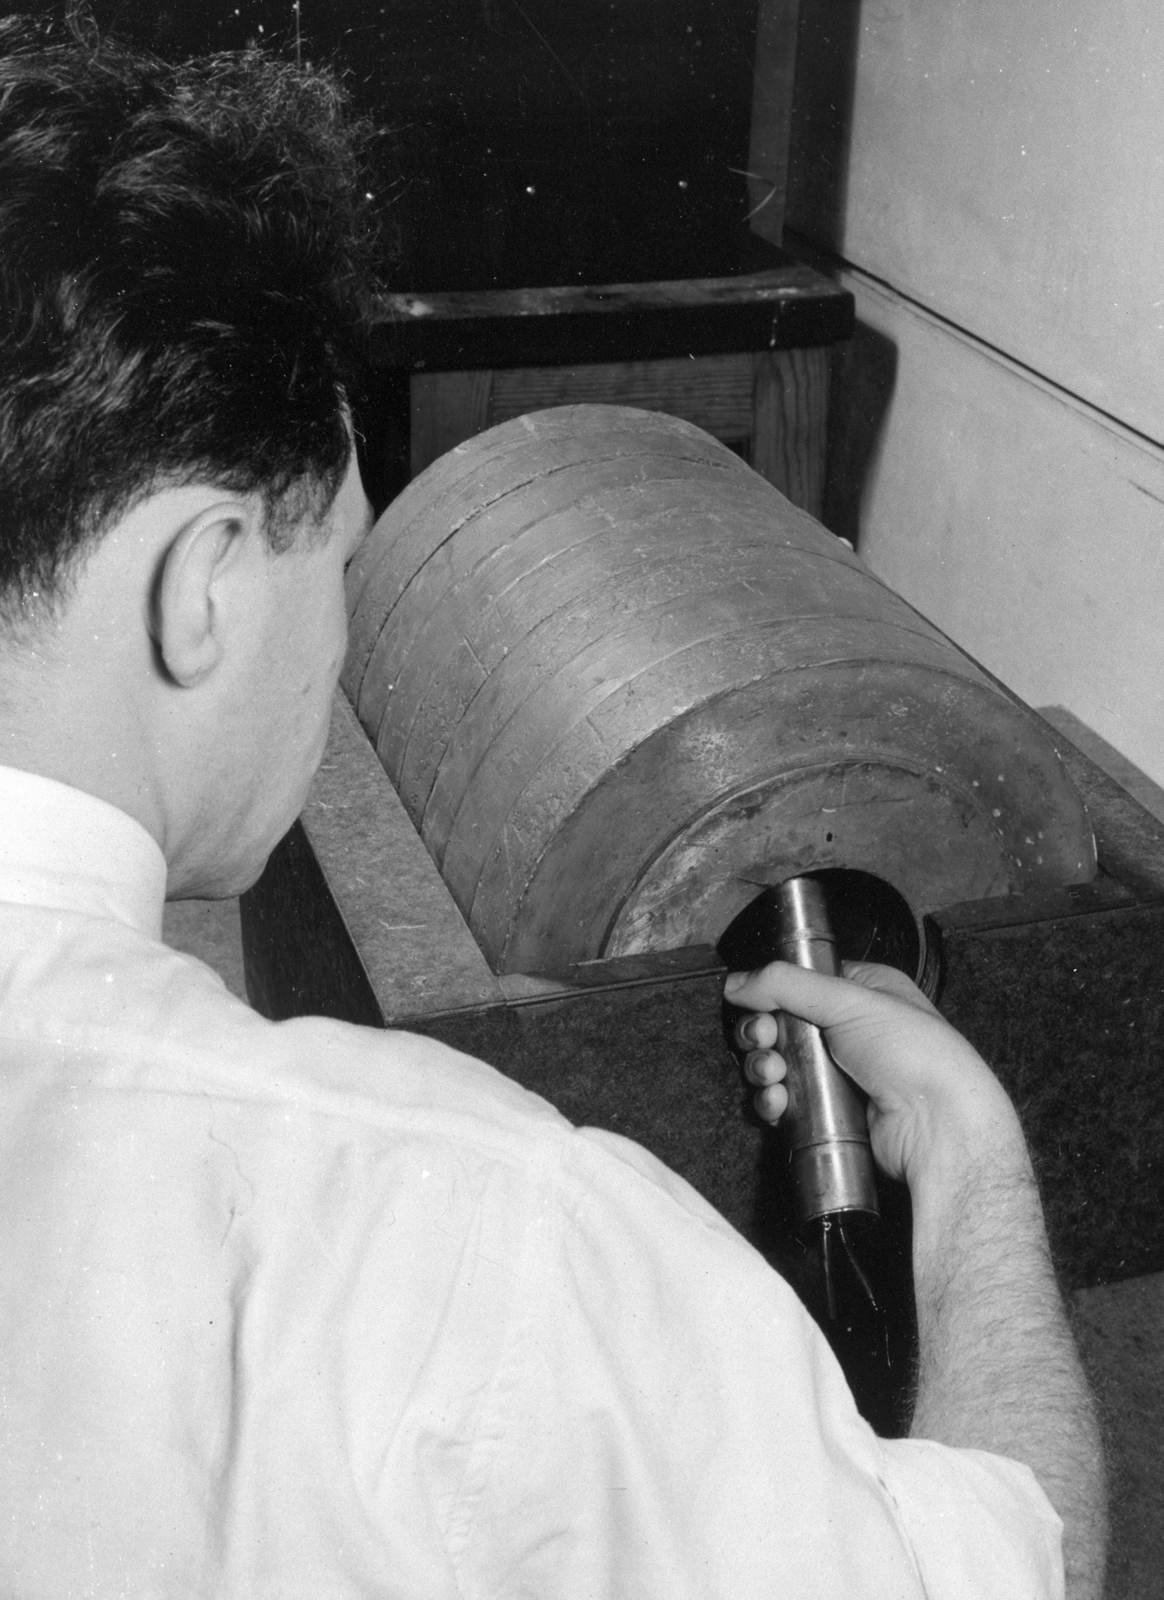 Joseph Gilbert Hamilton radiosodium experiment. January 1939. See also XBB 6808-4763(FMP record missing). [Photographer: Donald Cooksey]